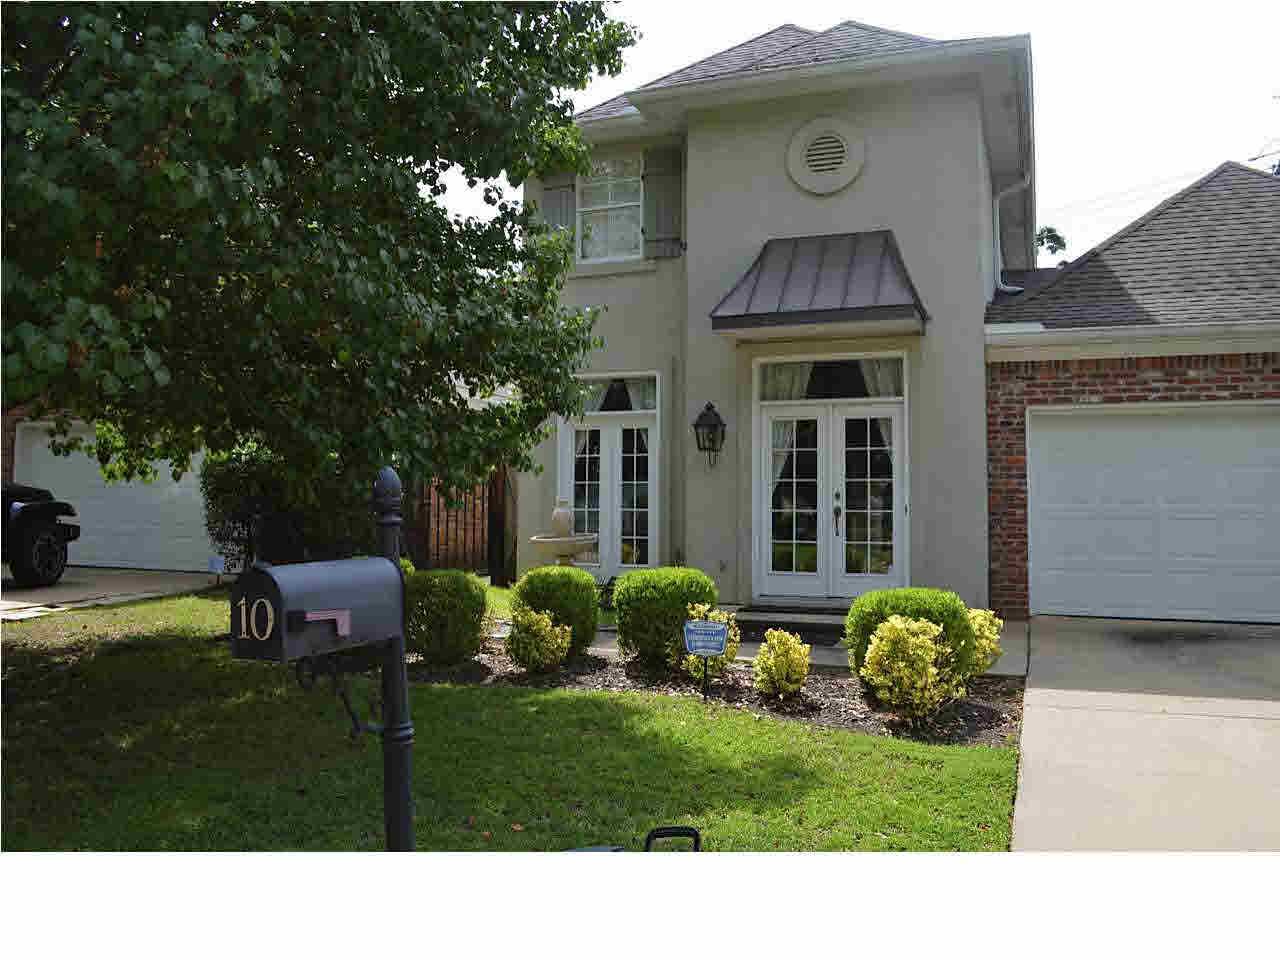 Real Estate for Sale, ListingId: 35186332, Jackson,MS39211